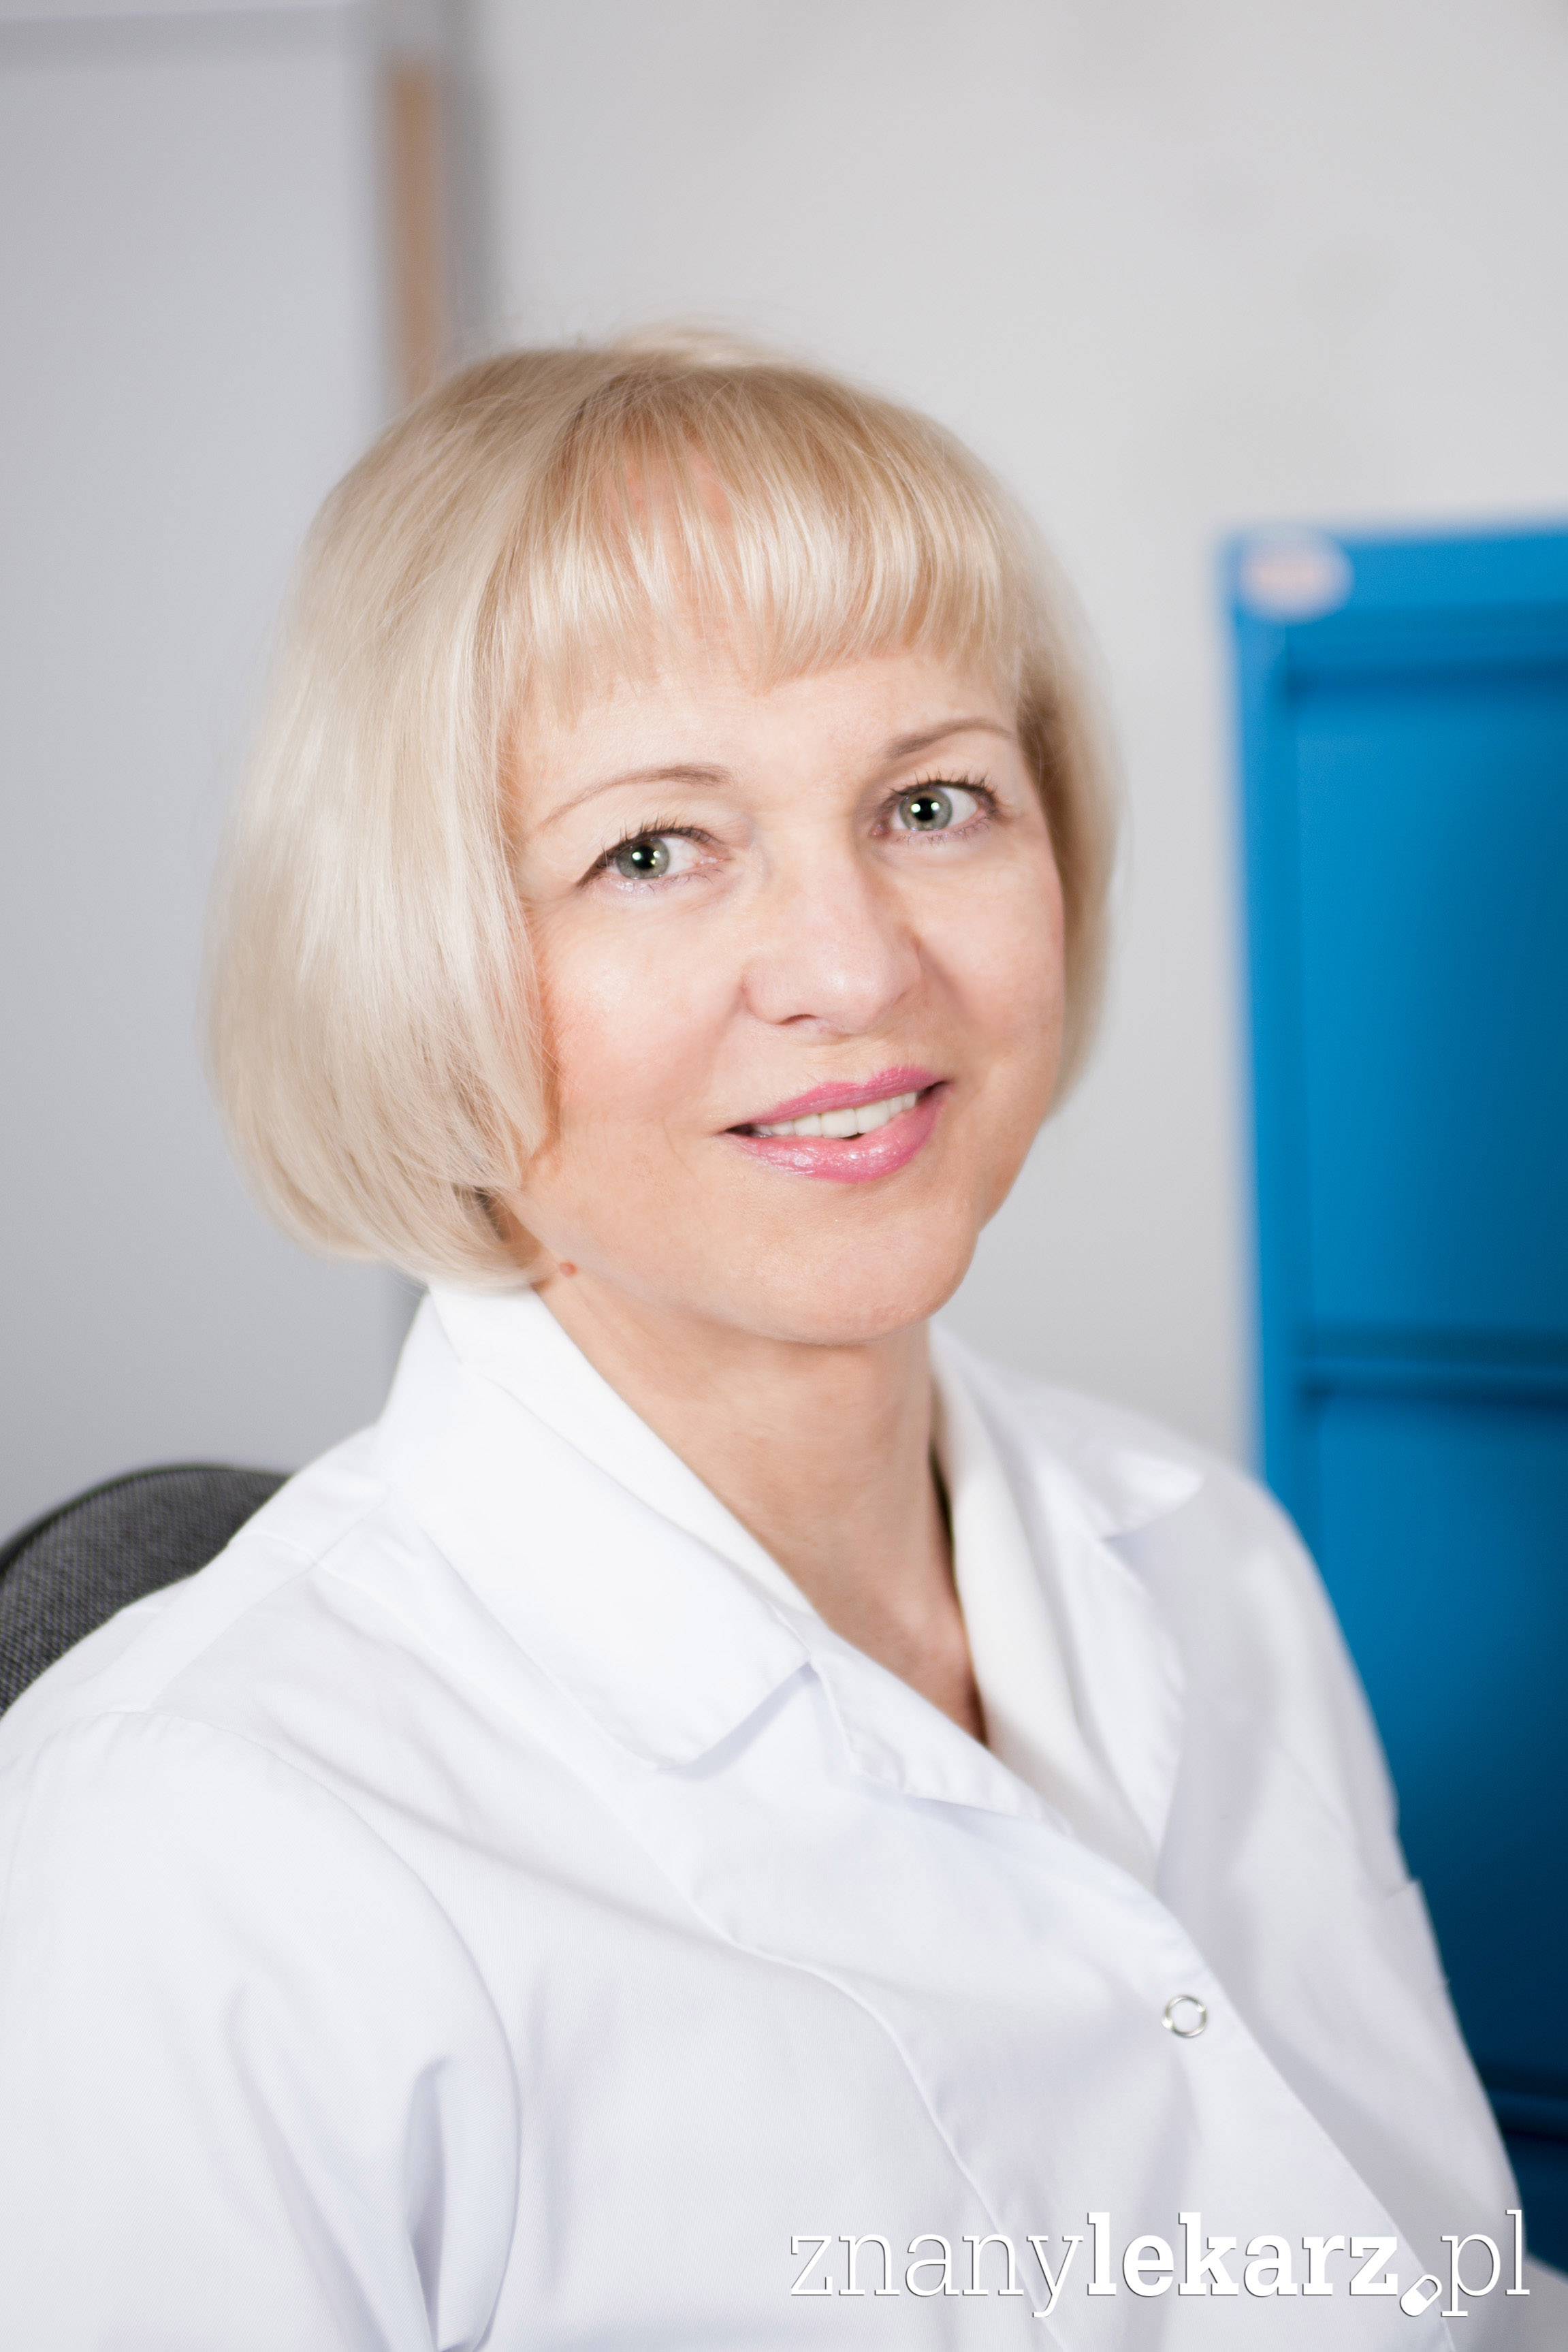 Hanna Kalotka-Kręglewska